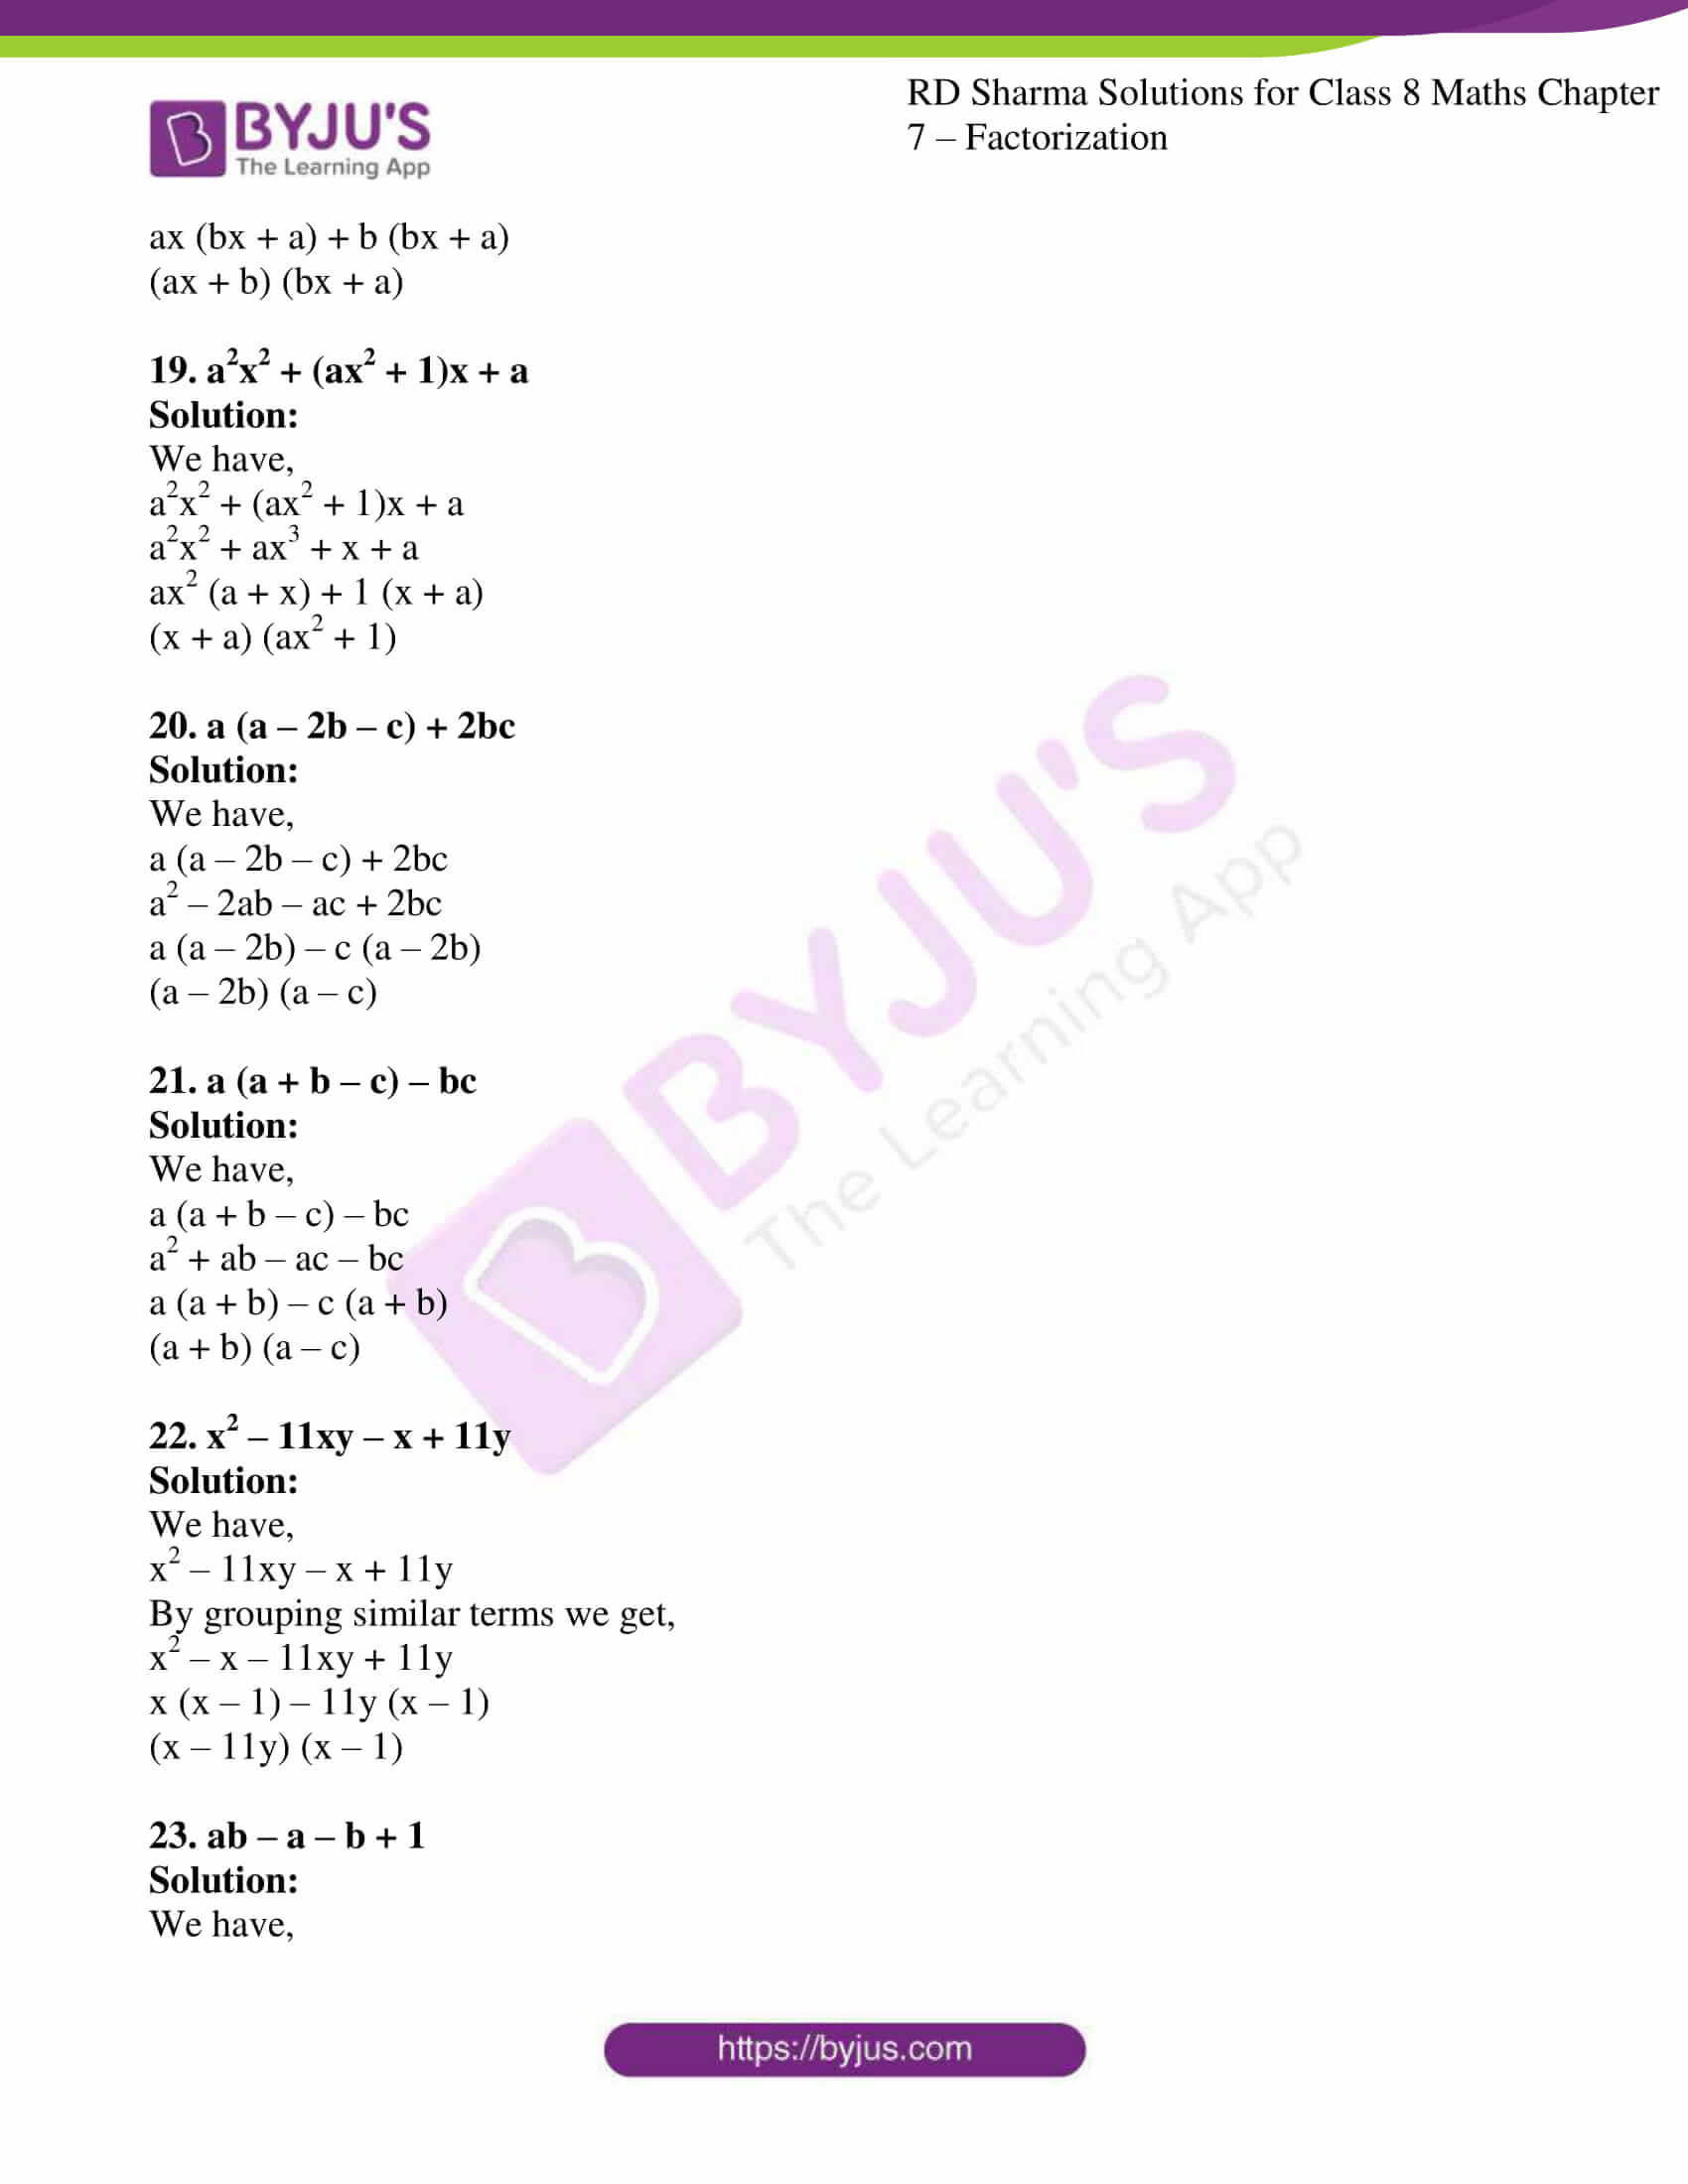 rd sharma class 8 maths chapter 7 exercise 4 5